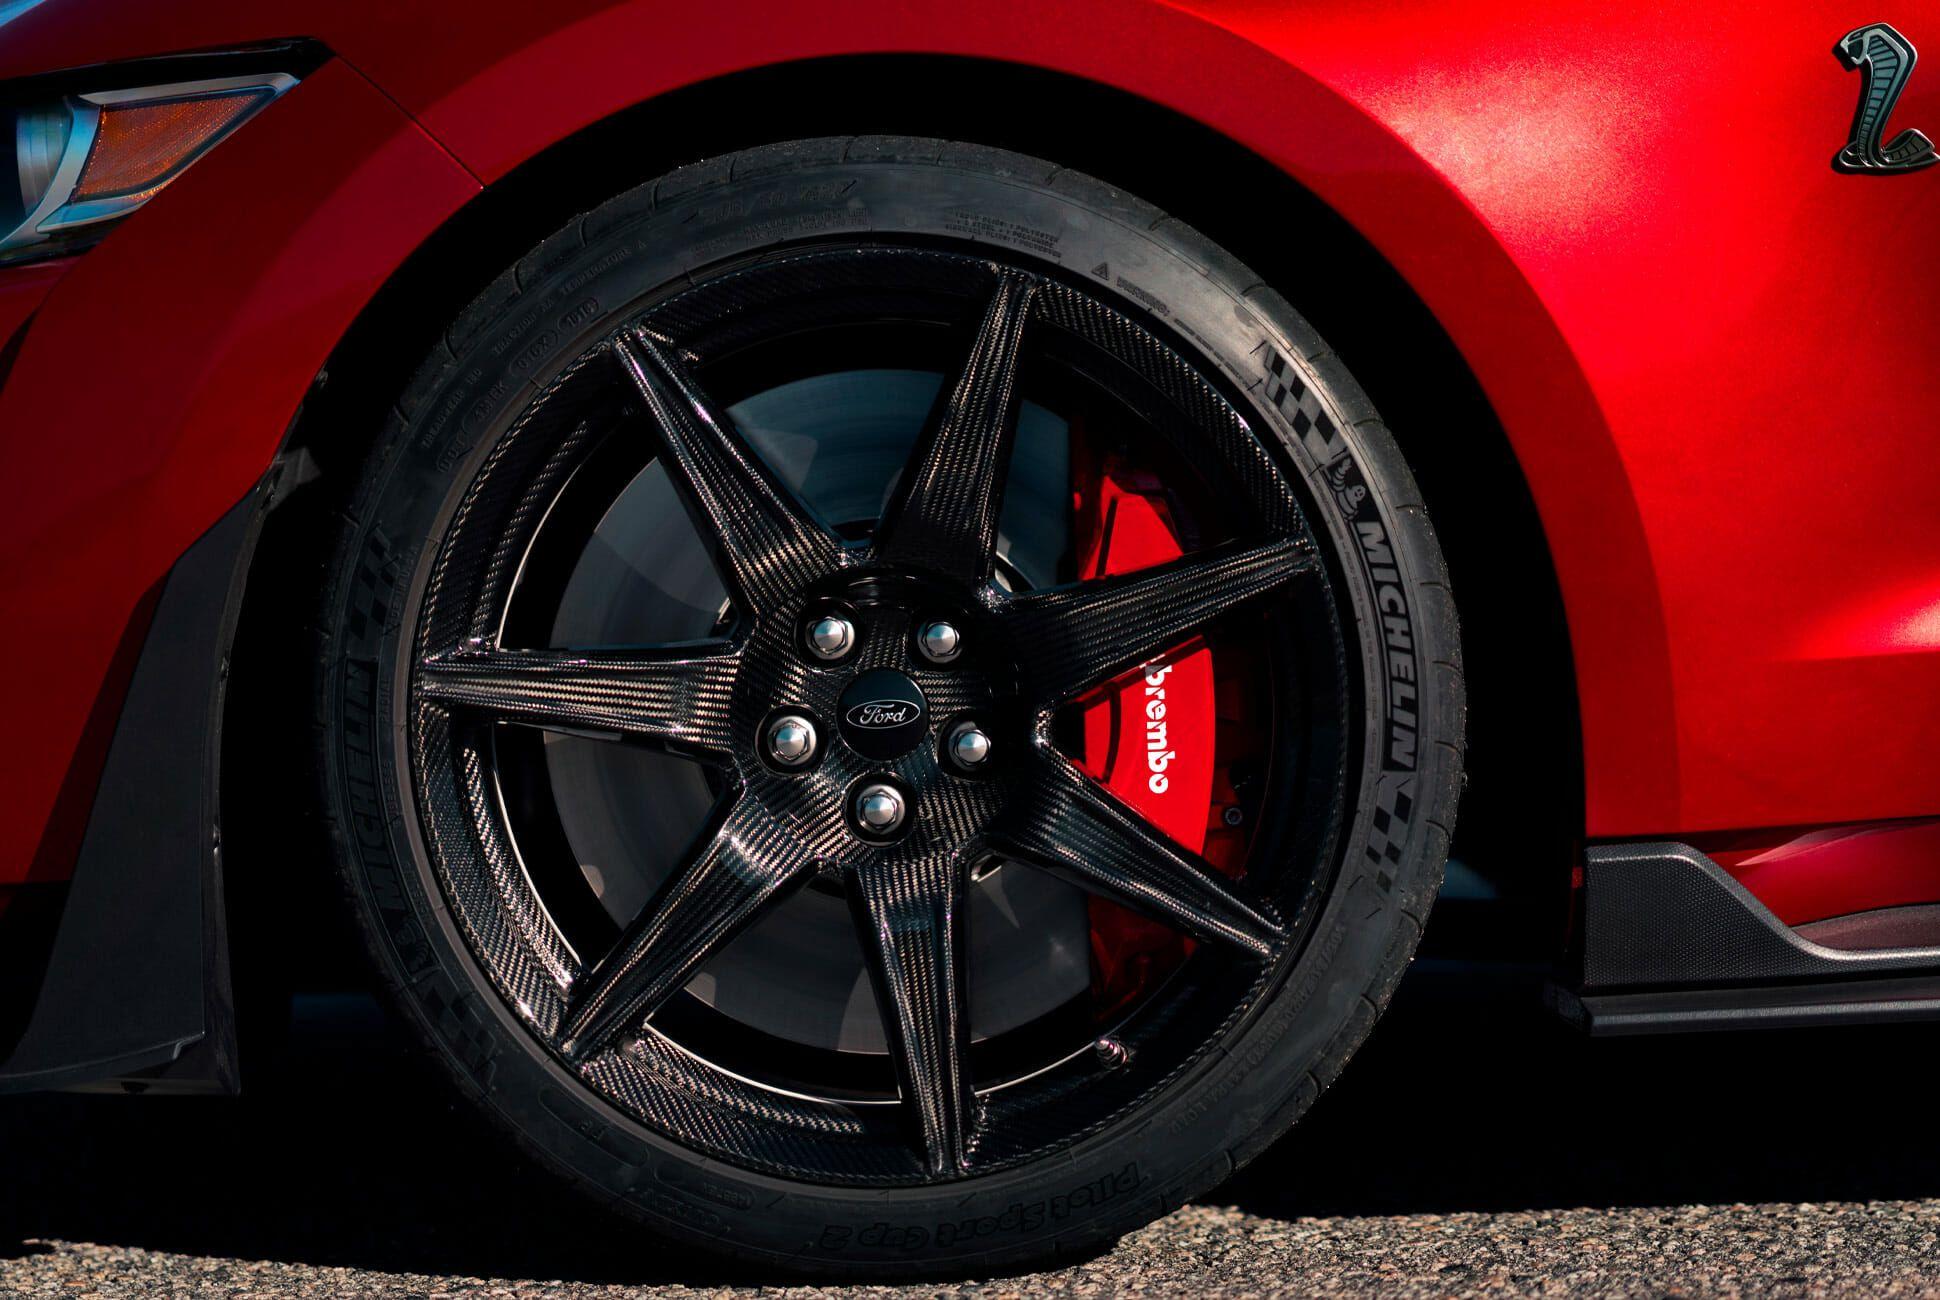 Mustang-GT500-Gear-Patrol-slide-5